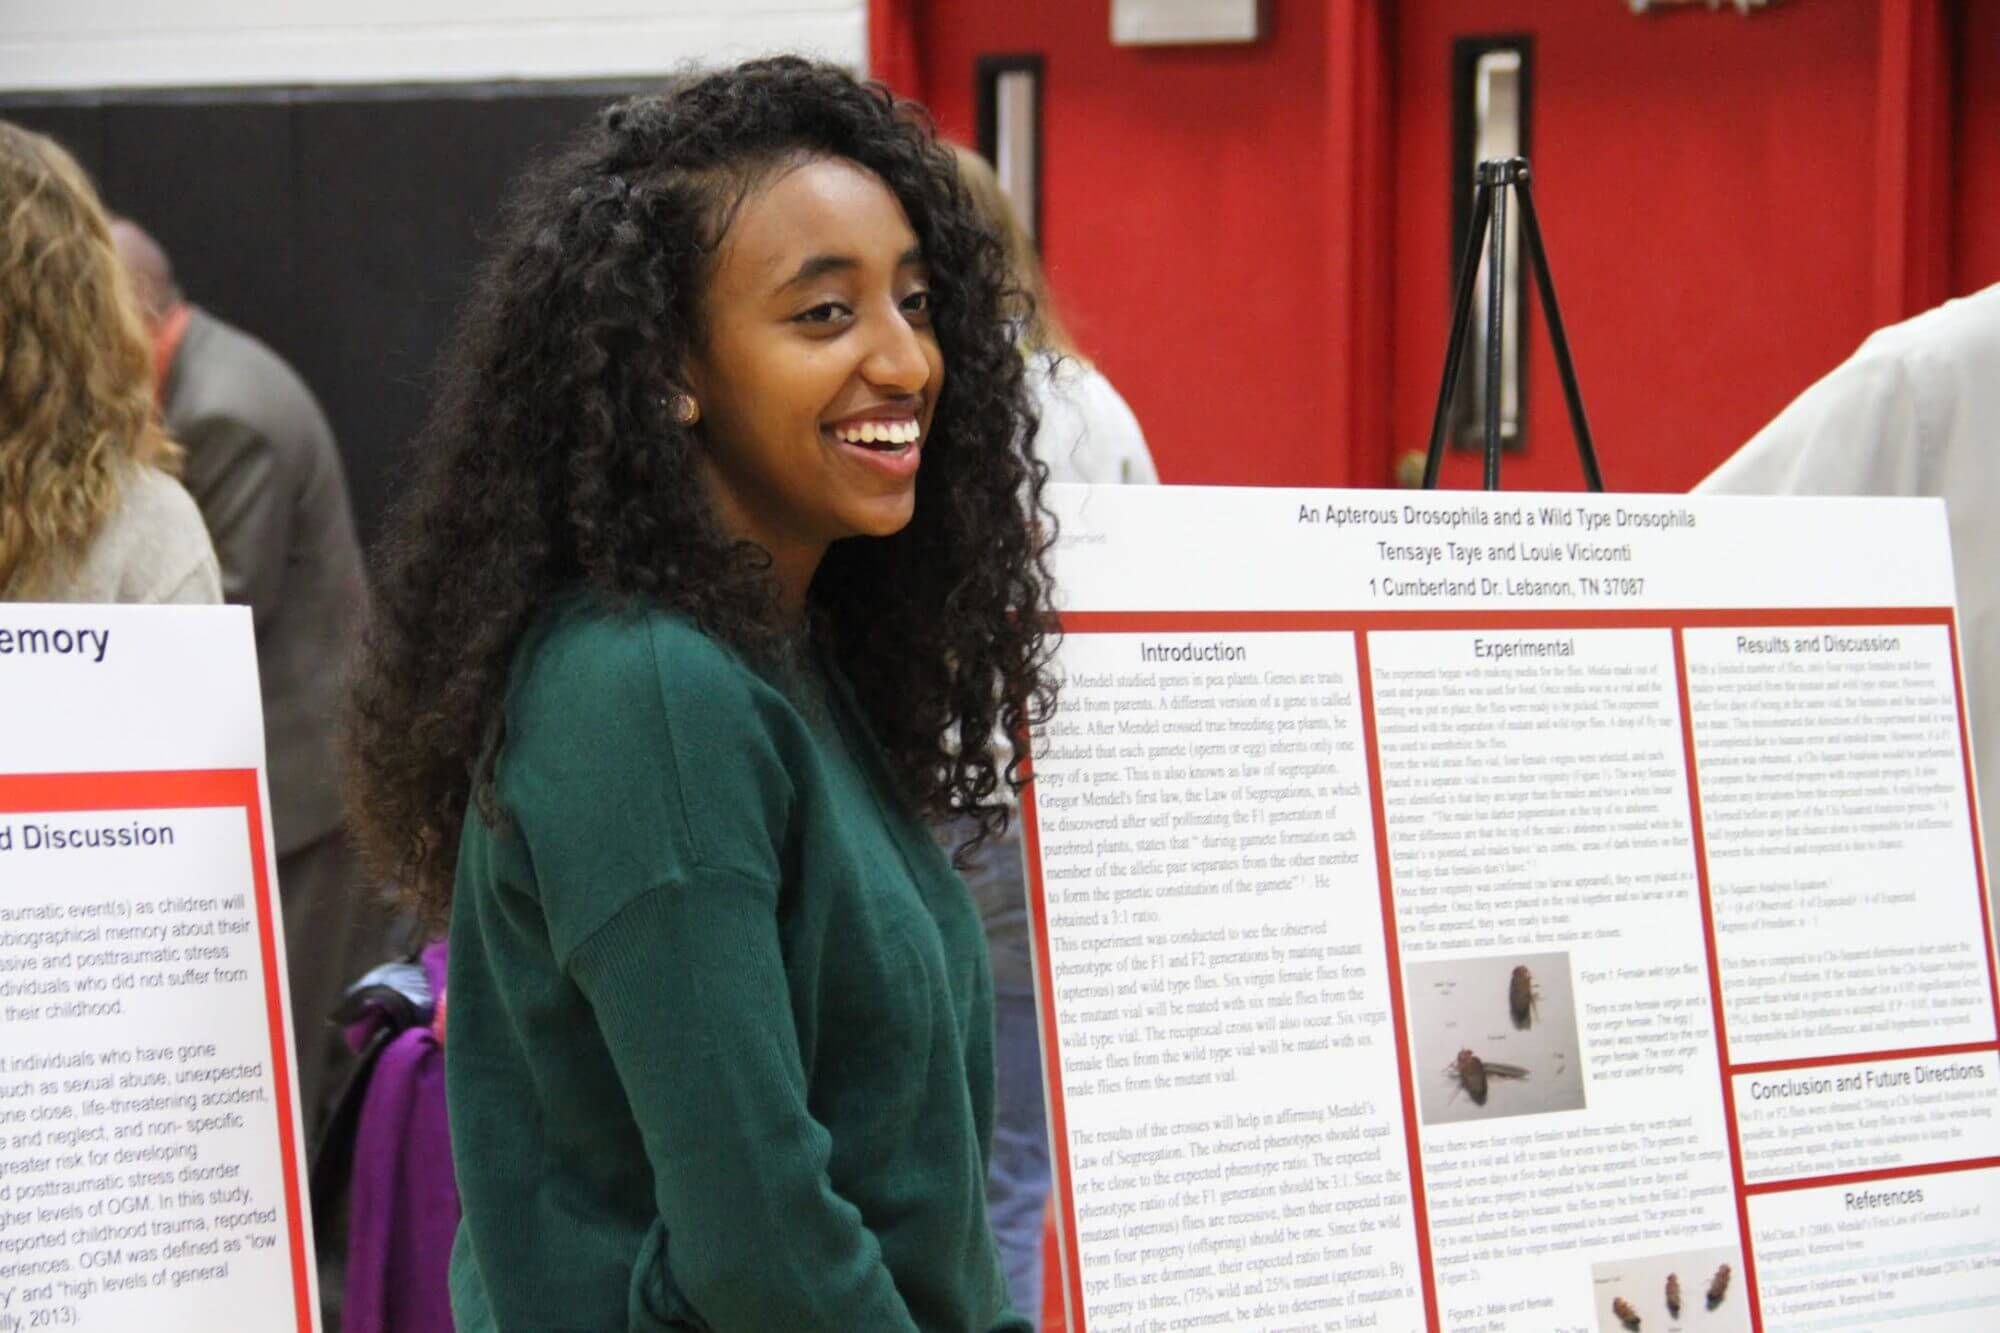 Female student presenting at Cumberland University